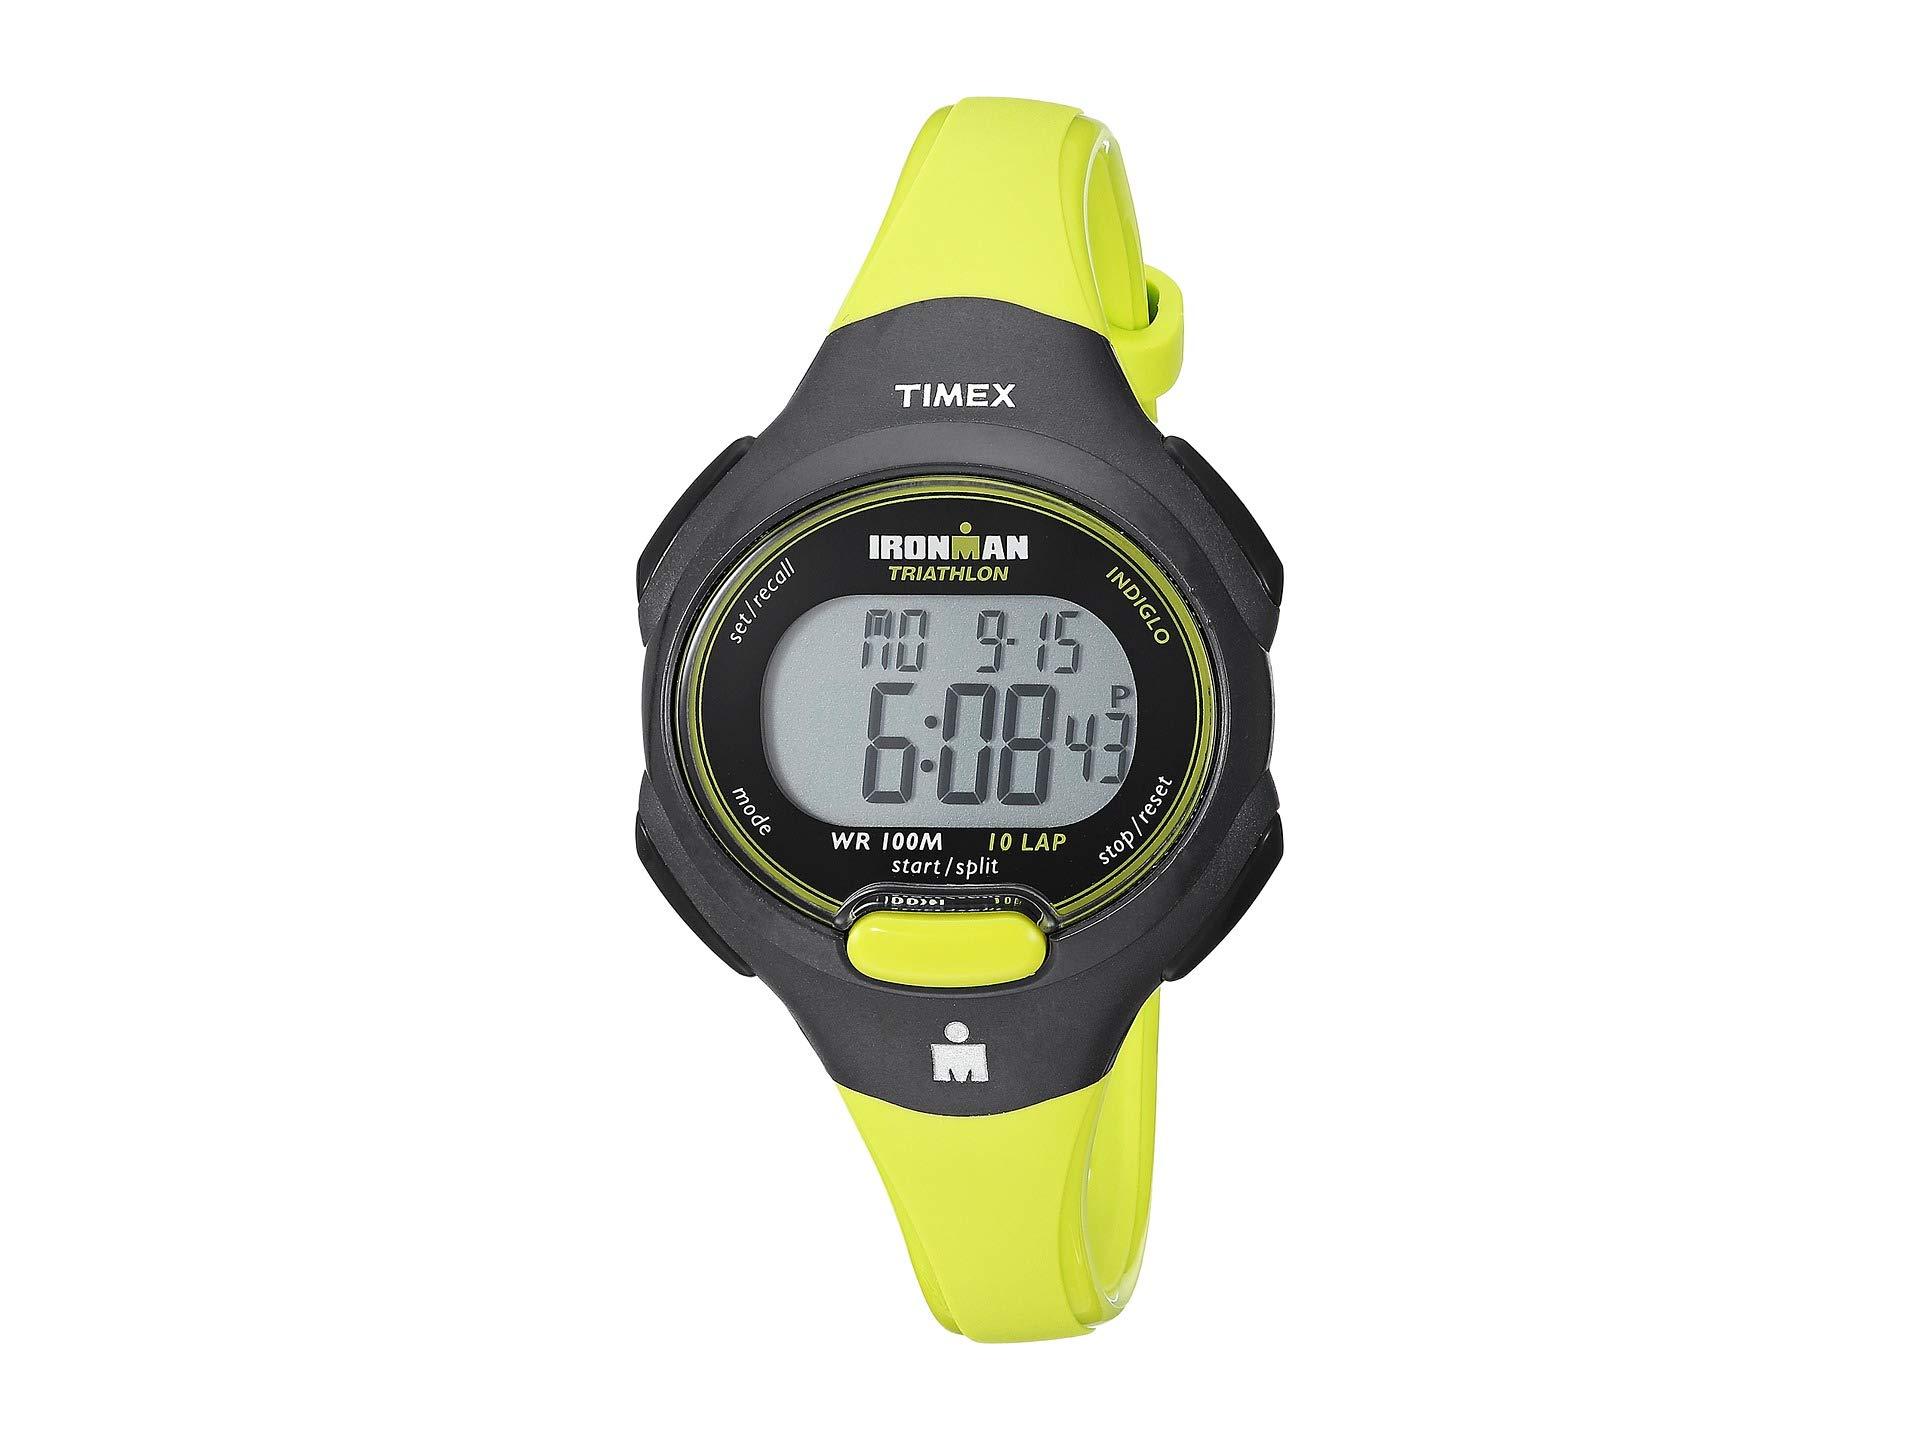 Reloj para Mujer Timex Ironman Essential 10 Lap  + Timex en VeoyCompro.net